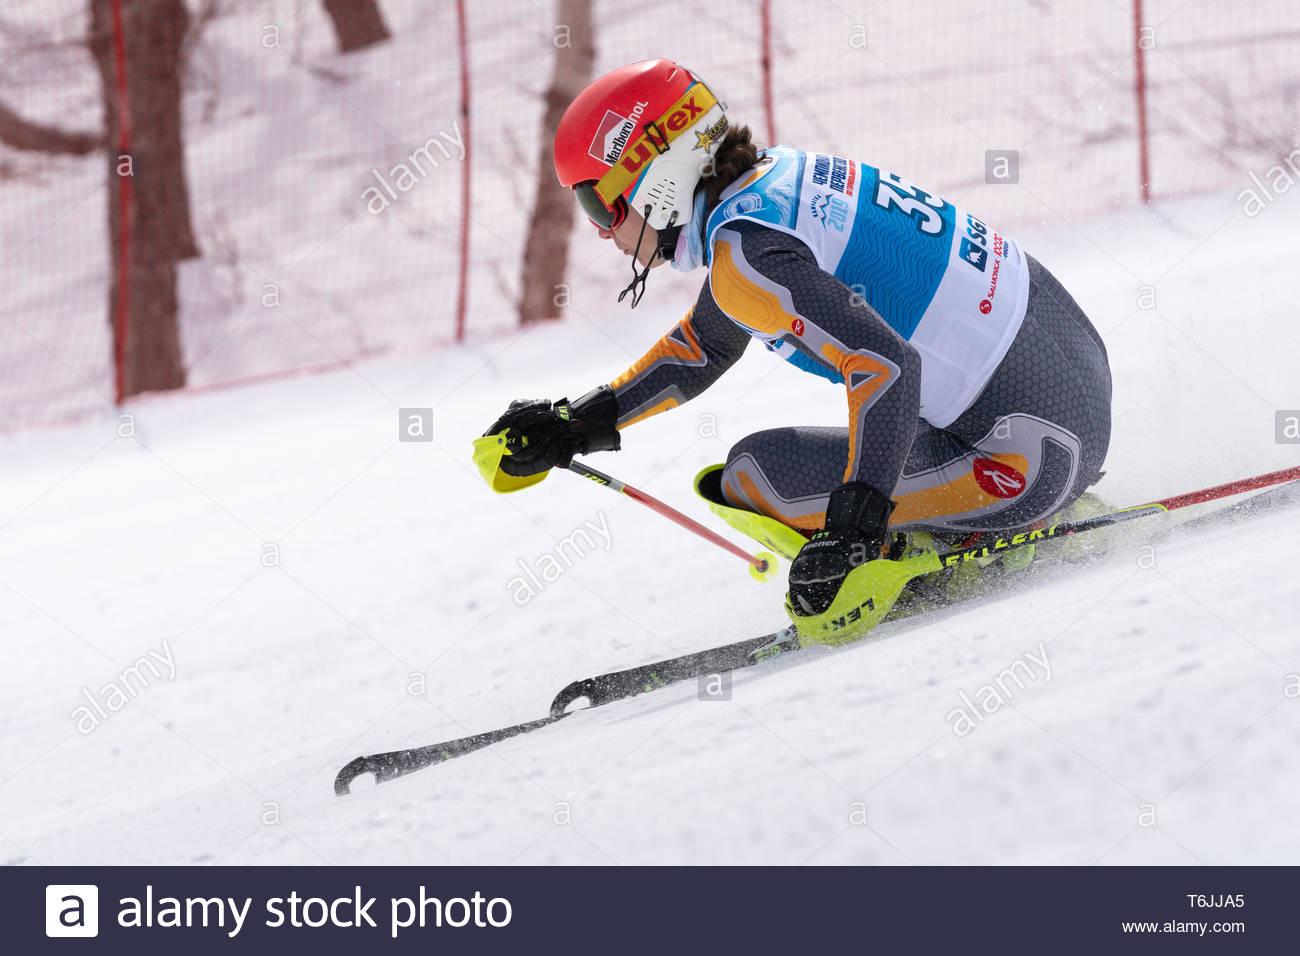 MOROZNAYA MOUNTAIN, KAMCHATKA PENINSULA, RUSSIA - MAR 29, 2019: International Ski Federation Championship, Russian Alpine Skiing Championship, slalom. - Stock Image